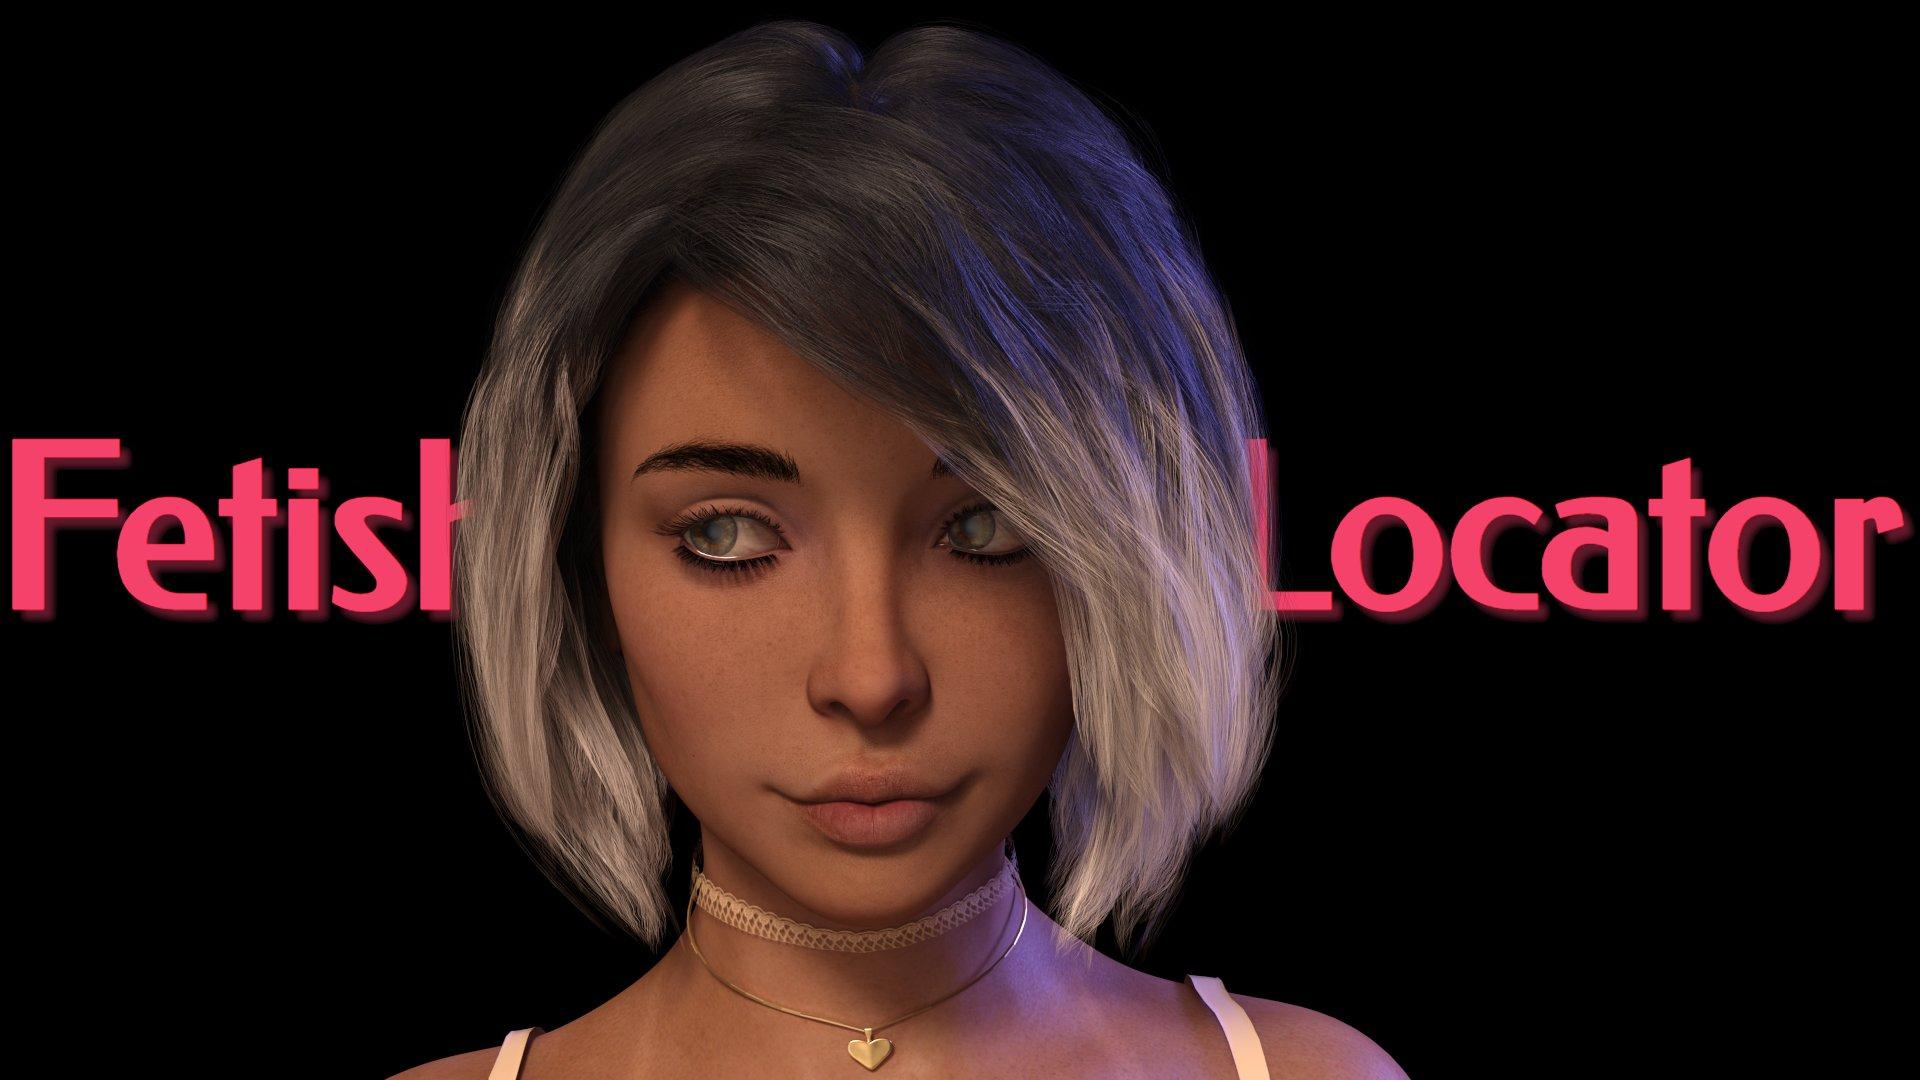 Fetish Locator – Version – 0.08.08 - Best patreon incest adult game 1